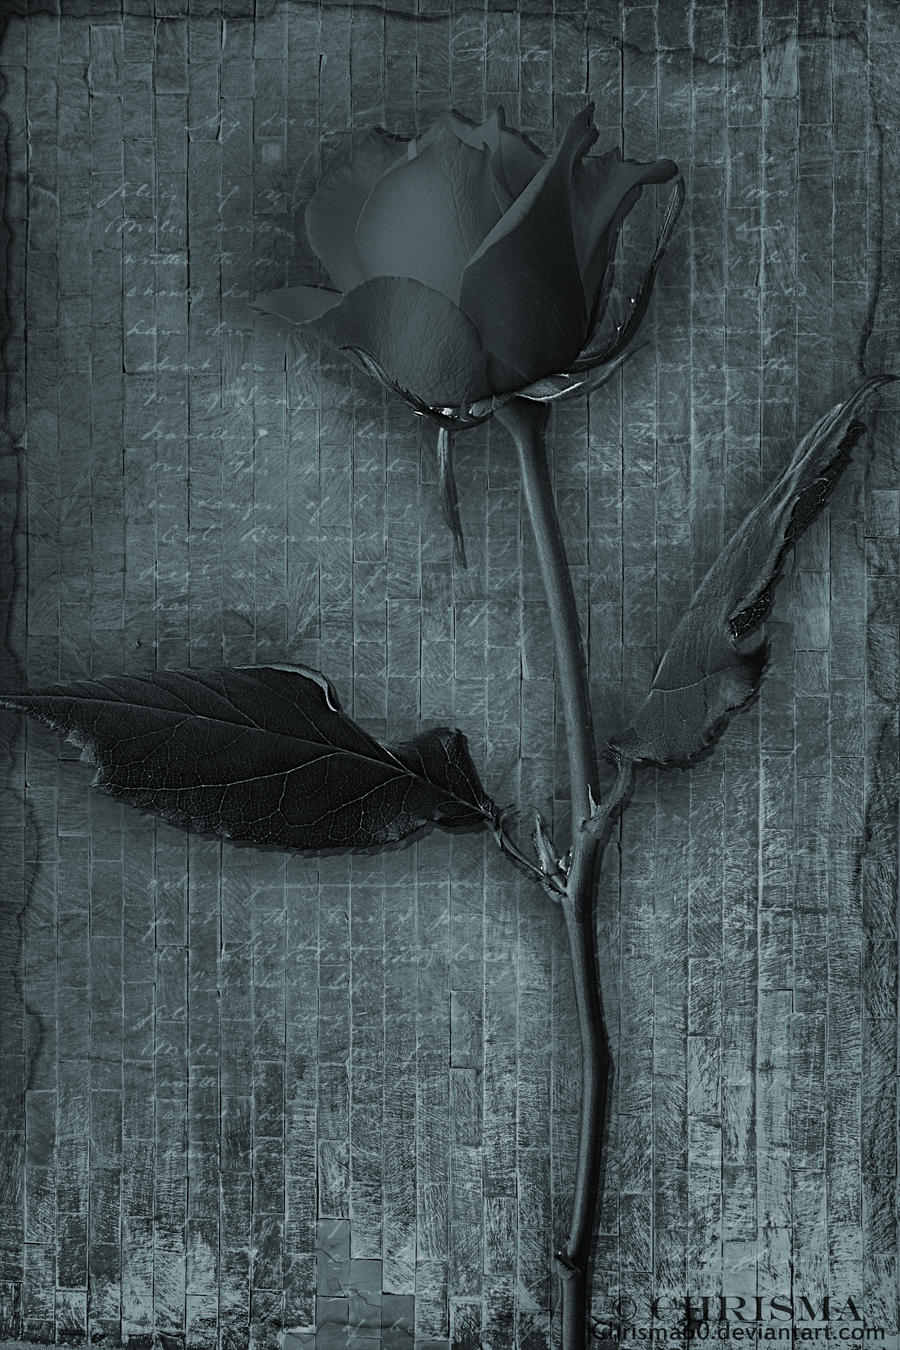 Black_Rose2 by Chrisma60